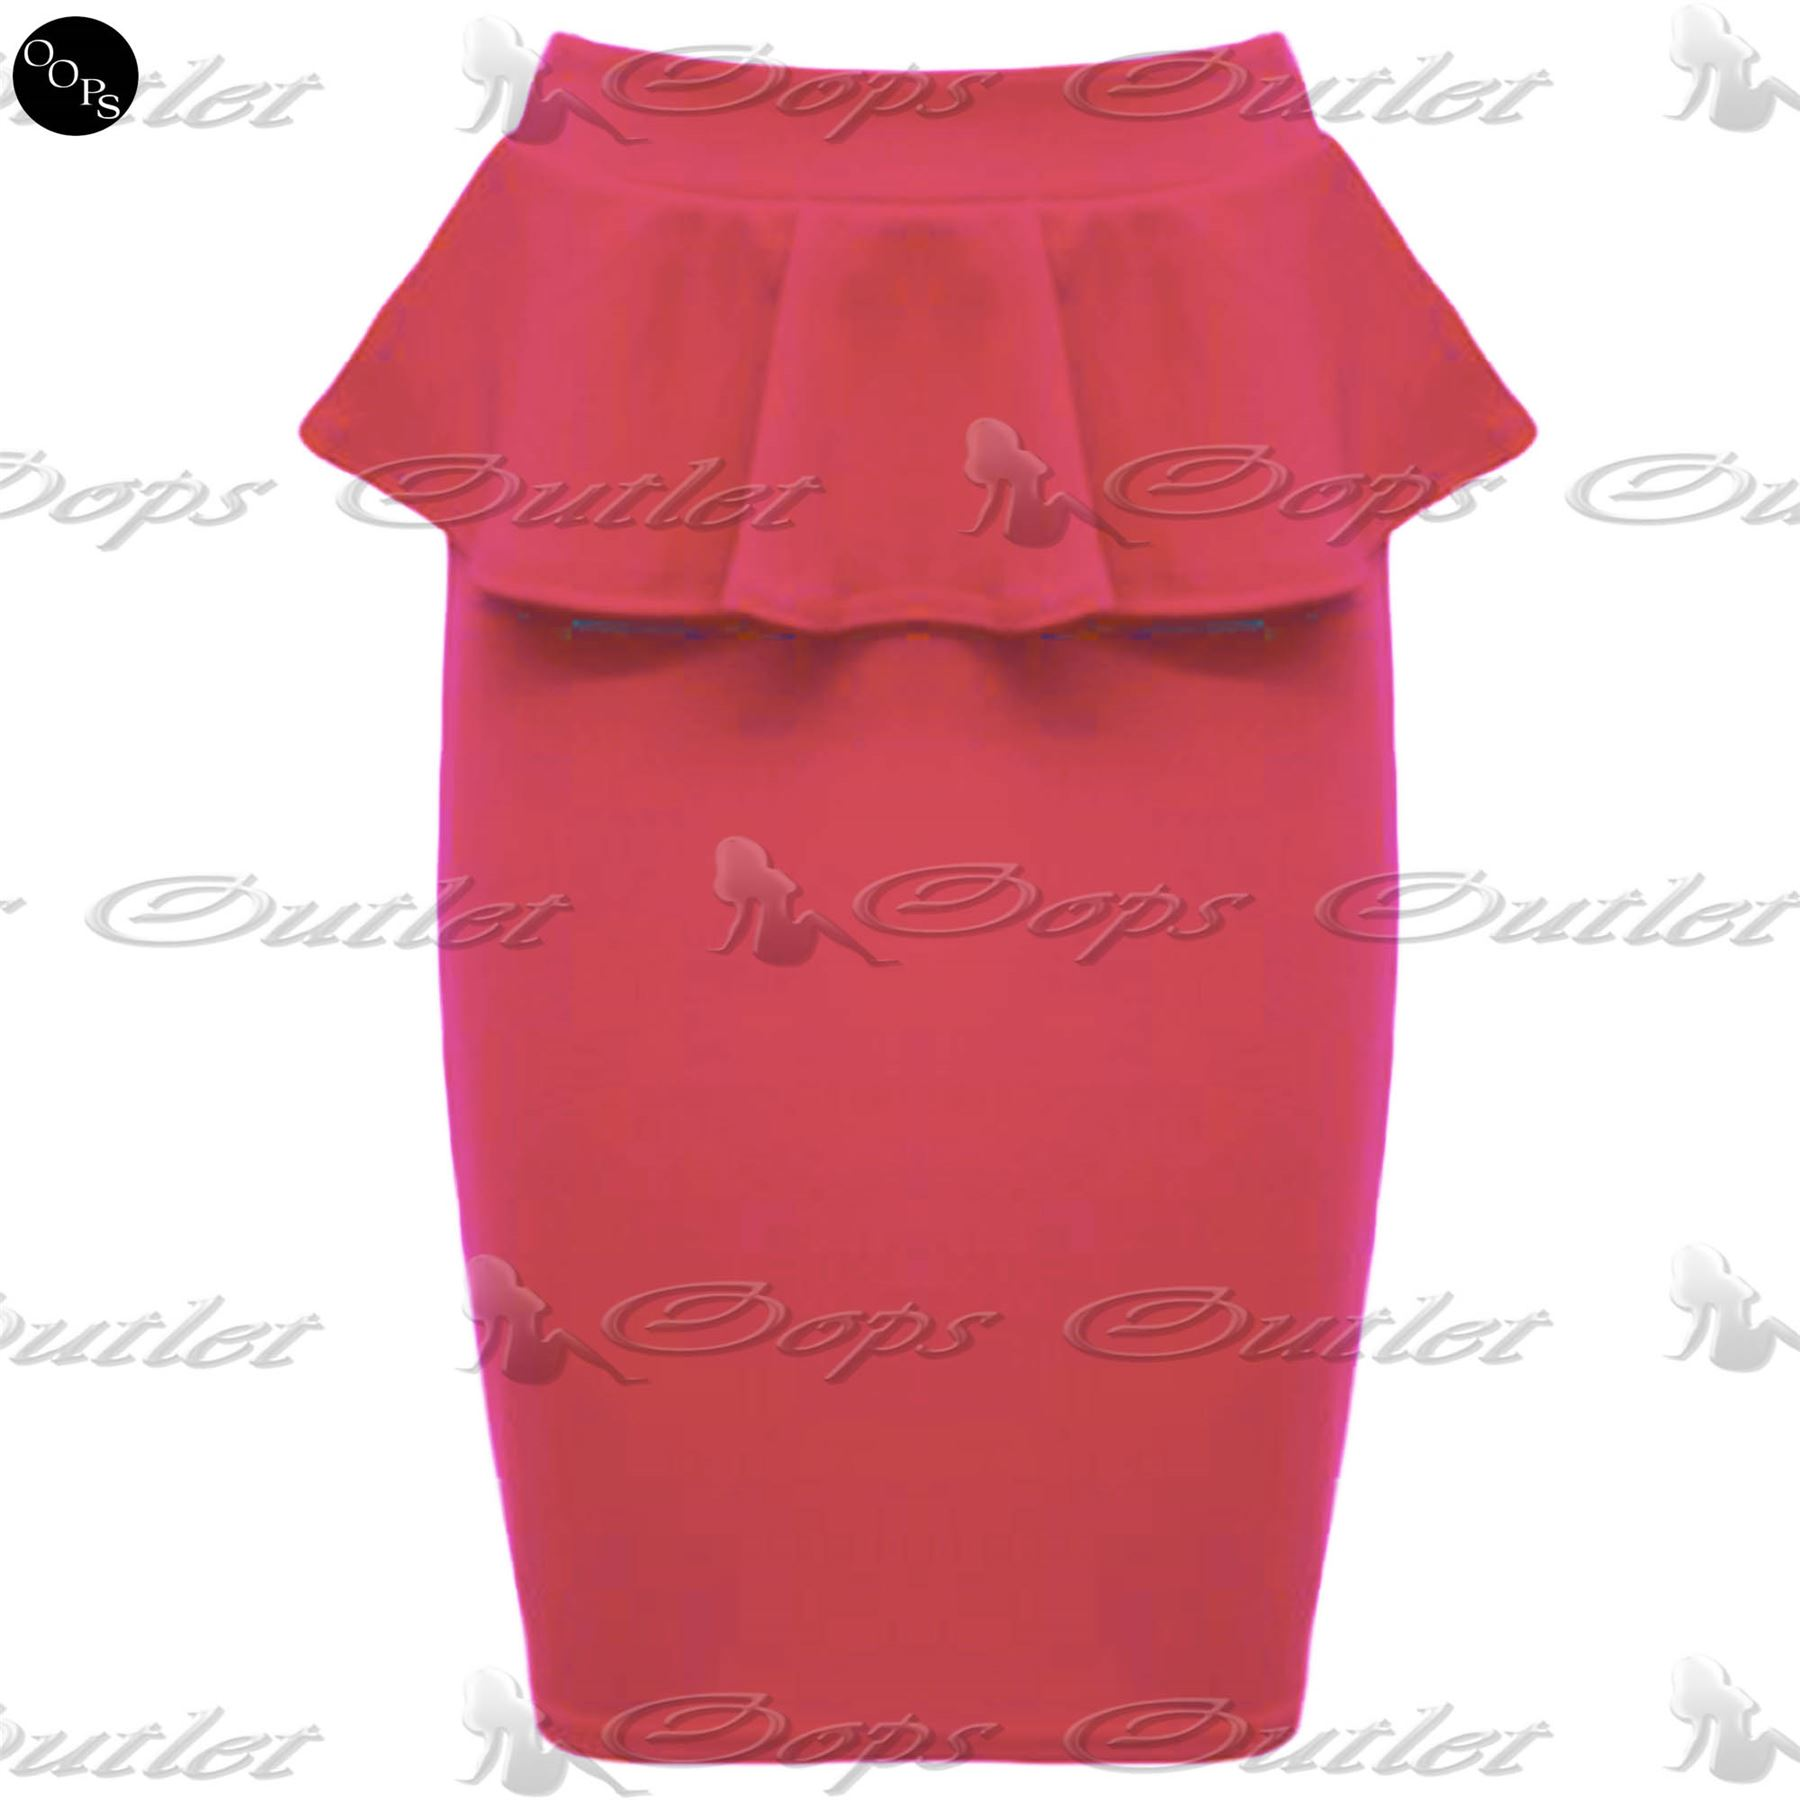 Womens Ladies Frill Bodycon Pencil Stretch Celeb Peplum Midi Skirt Plus Sizes